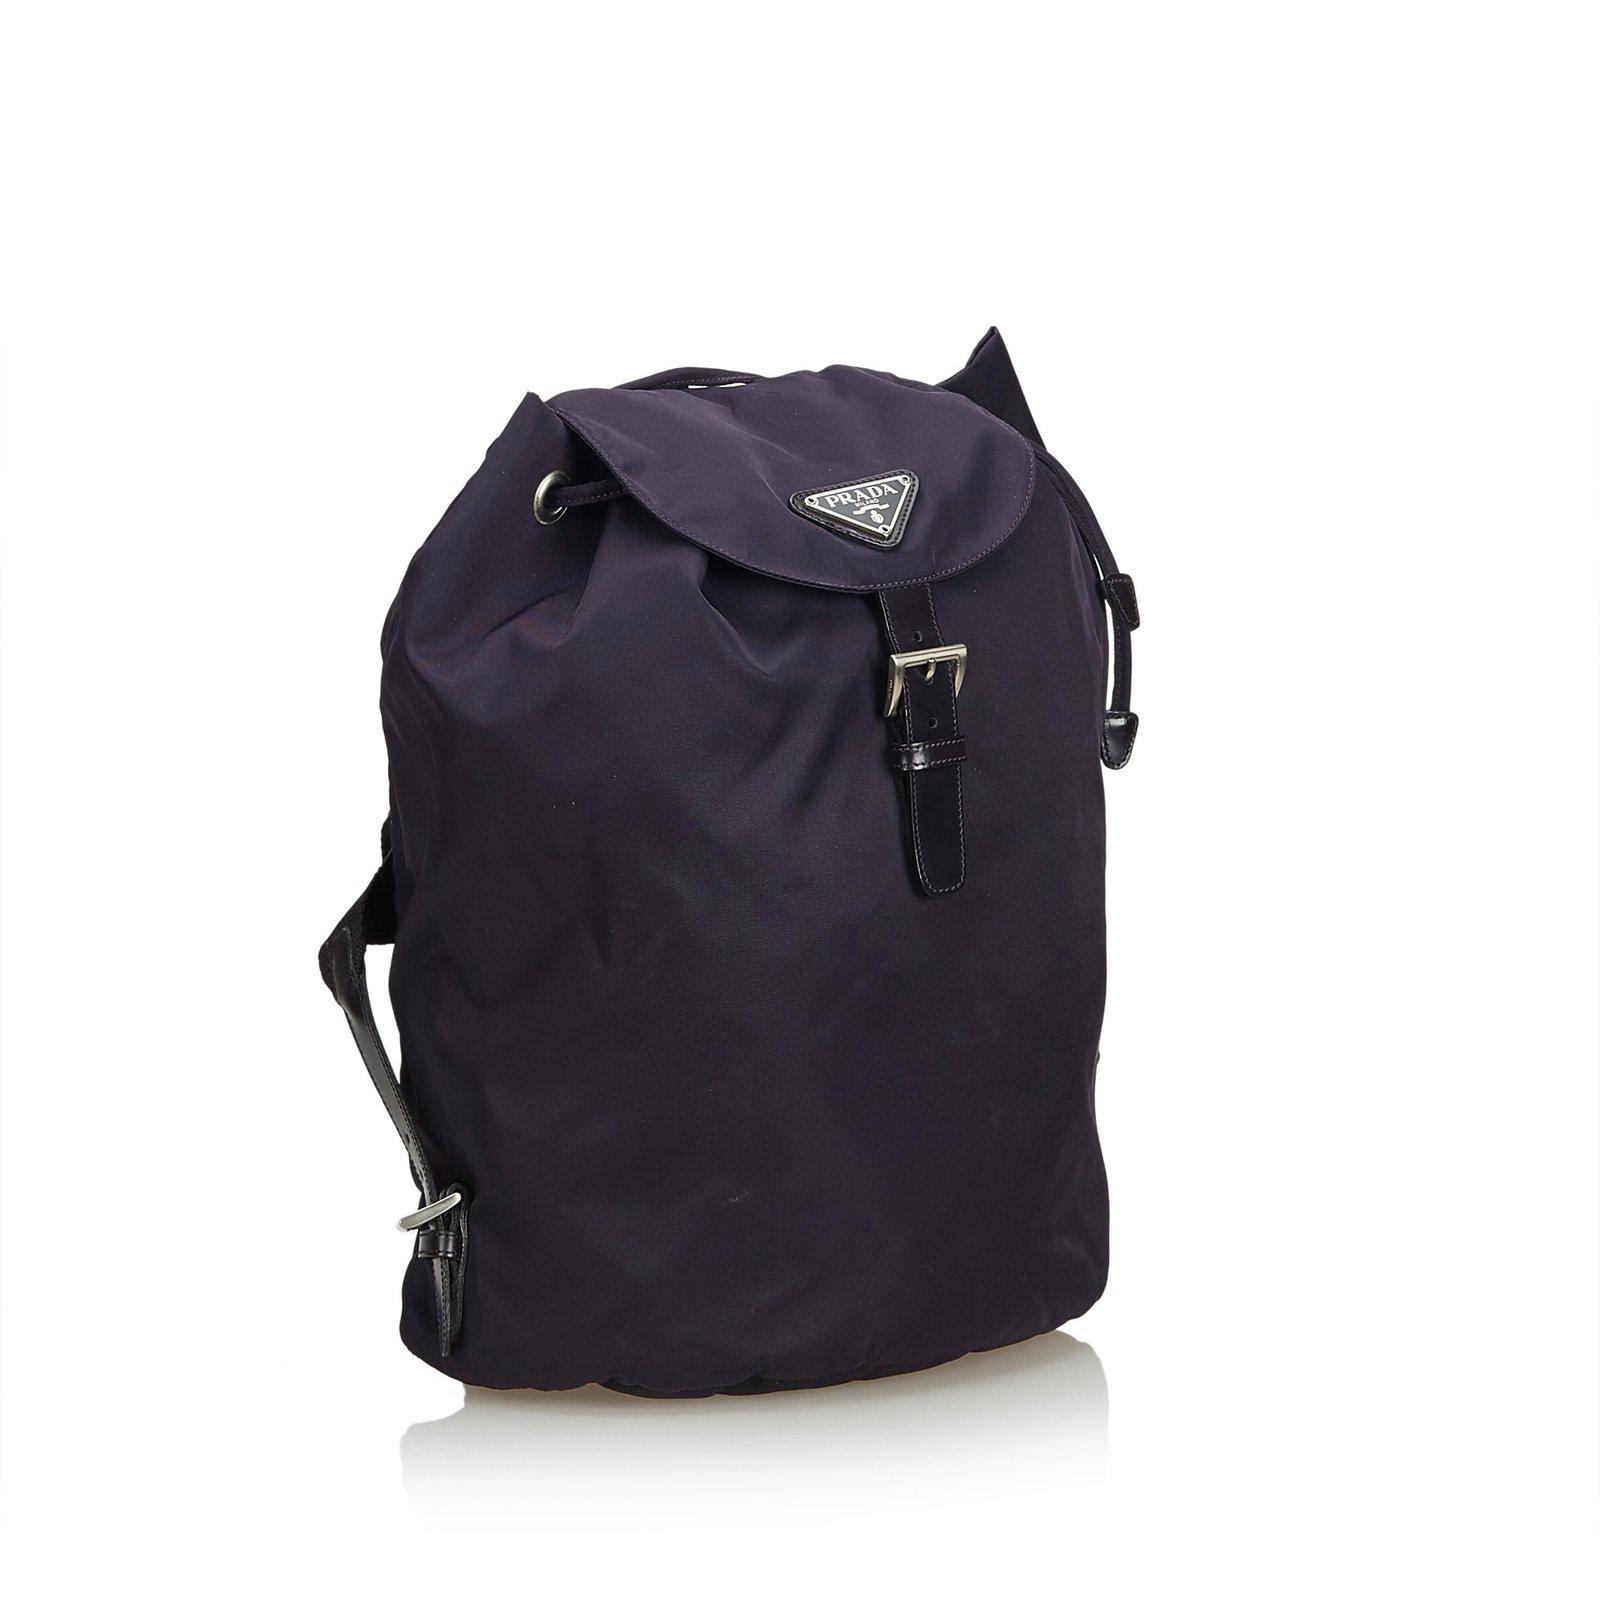 606f707c78a2 Prada Nylon Drawstring Backpack Backpacks Nylon